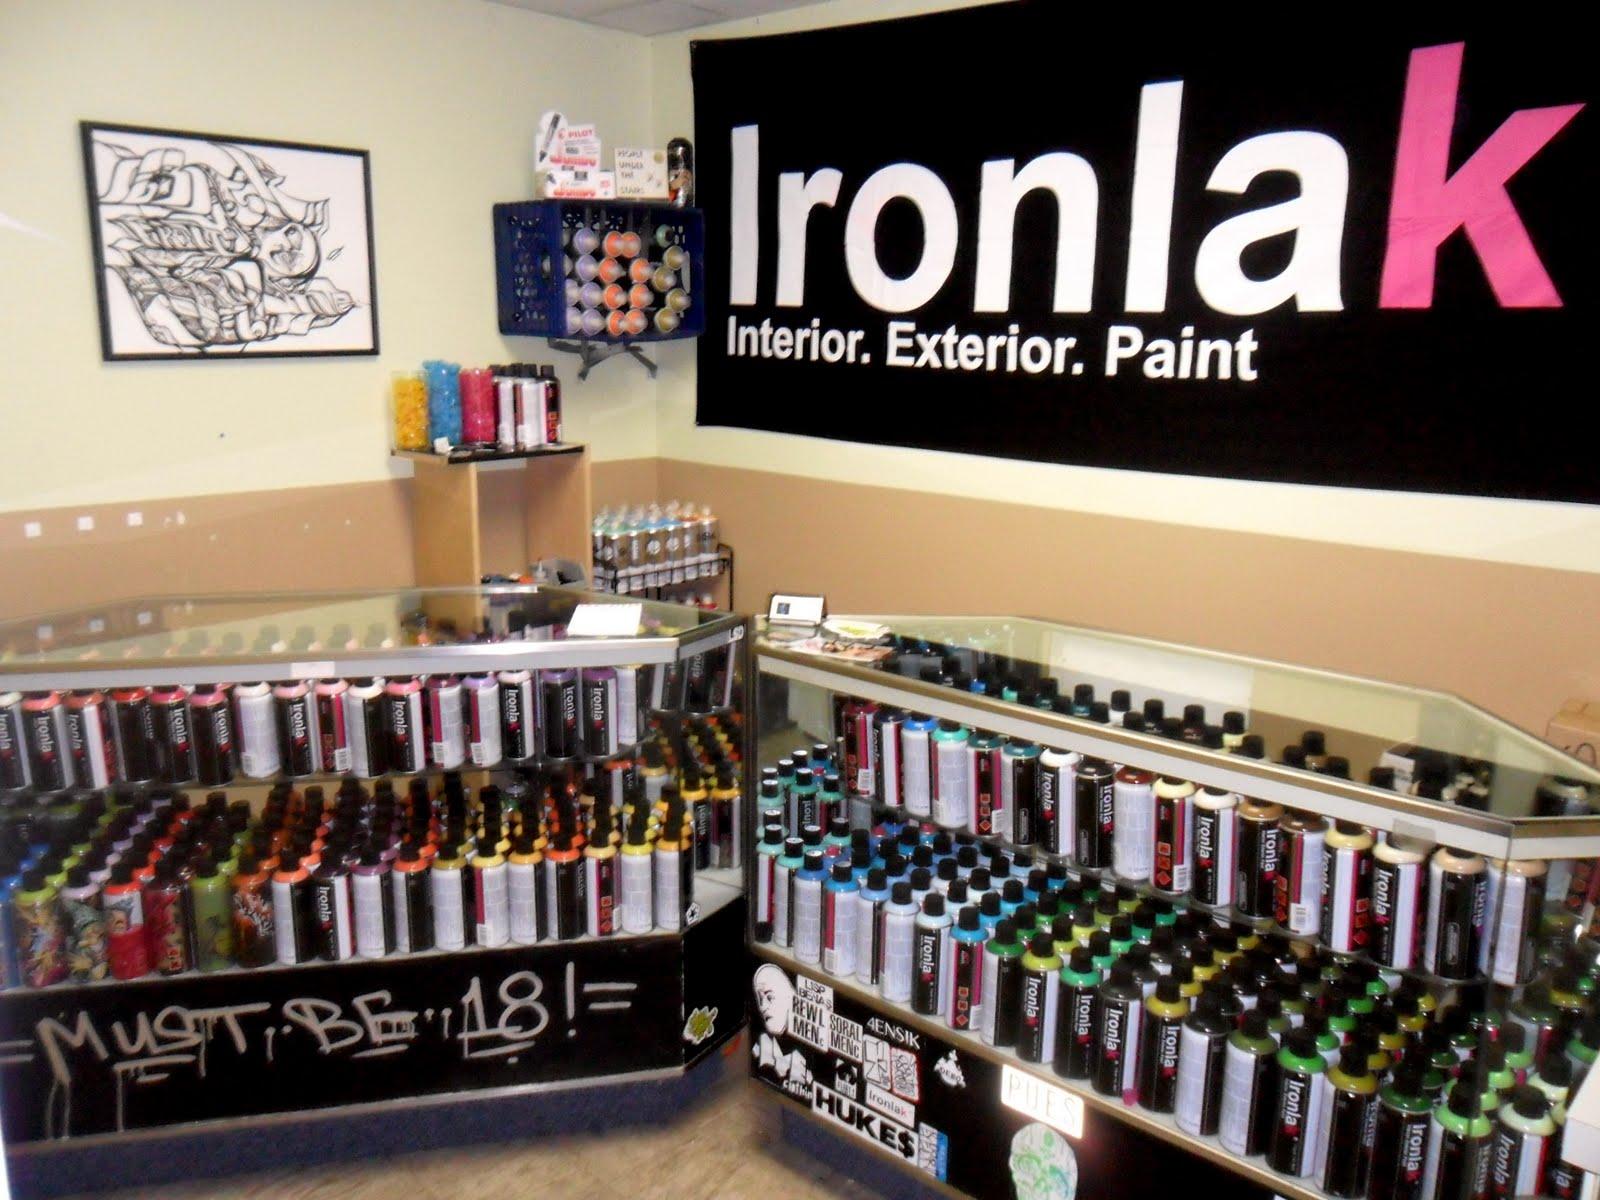 Graffiti Supplies - Bests Graffiti